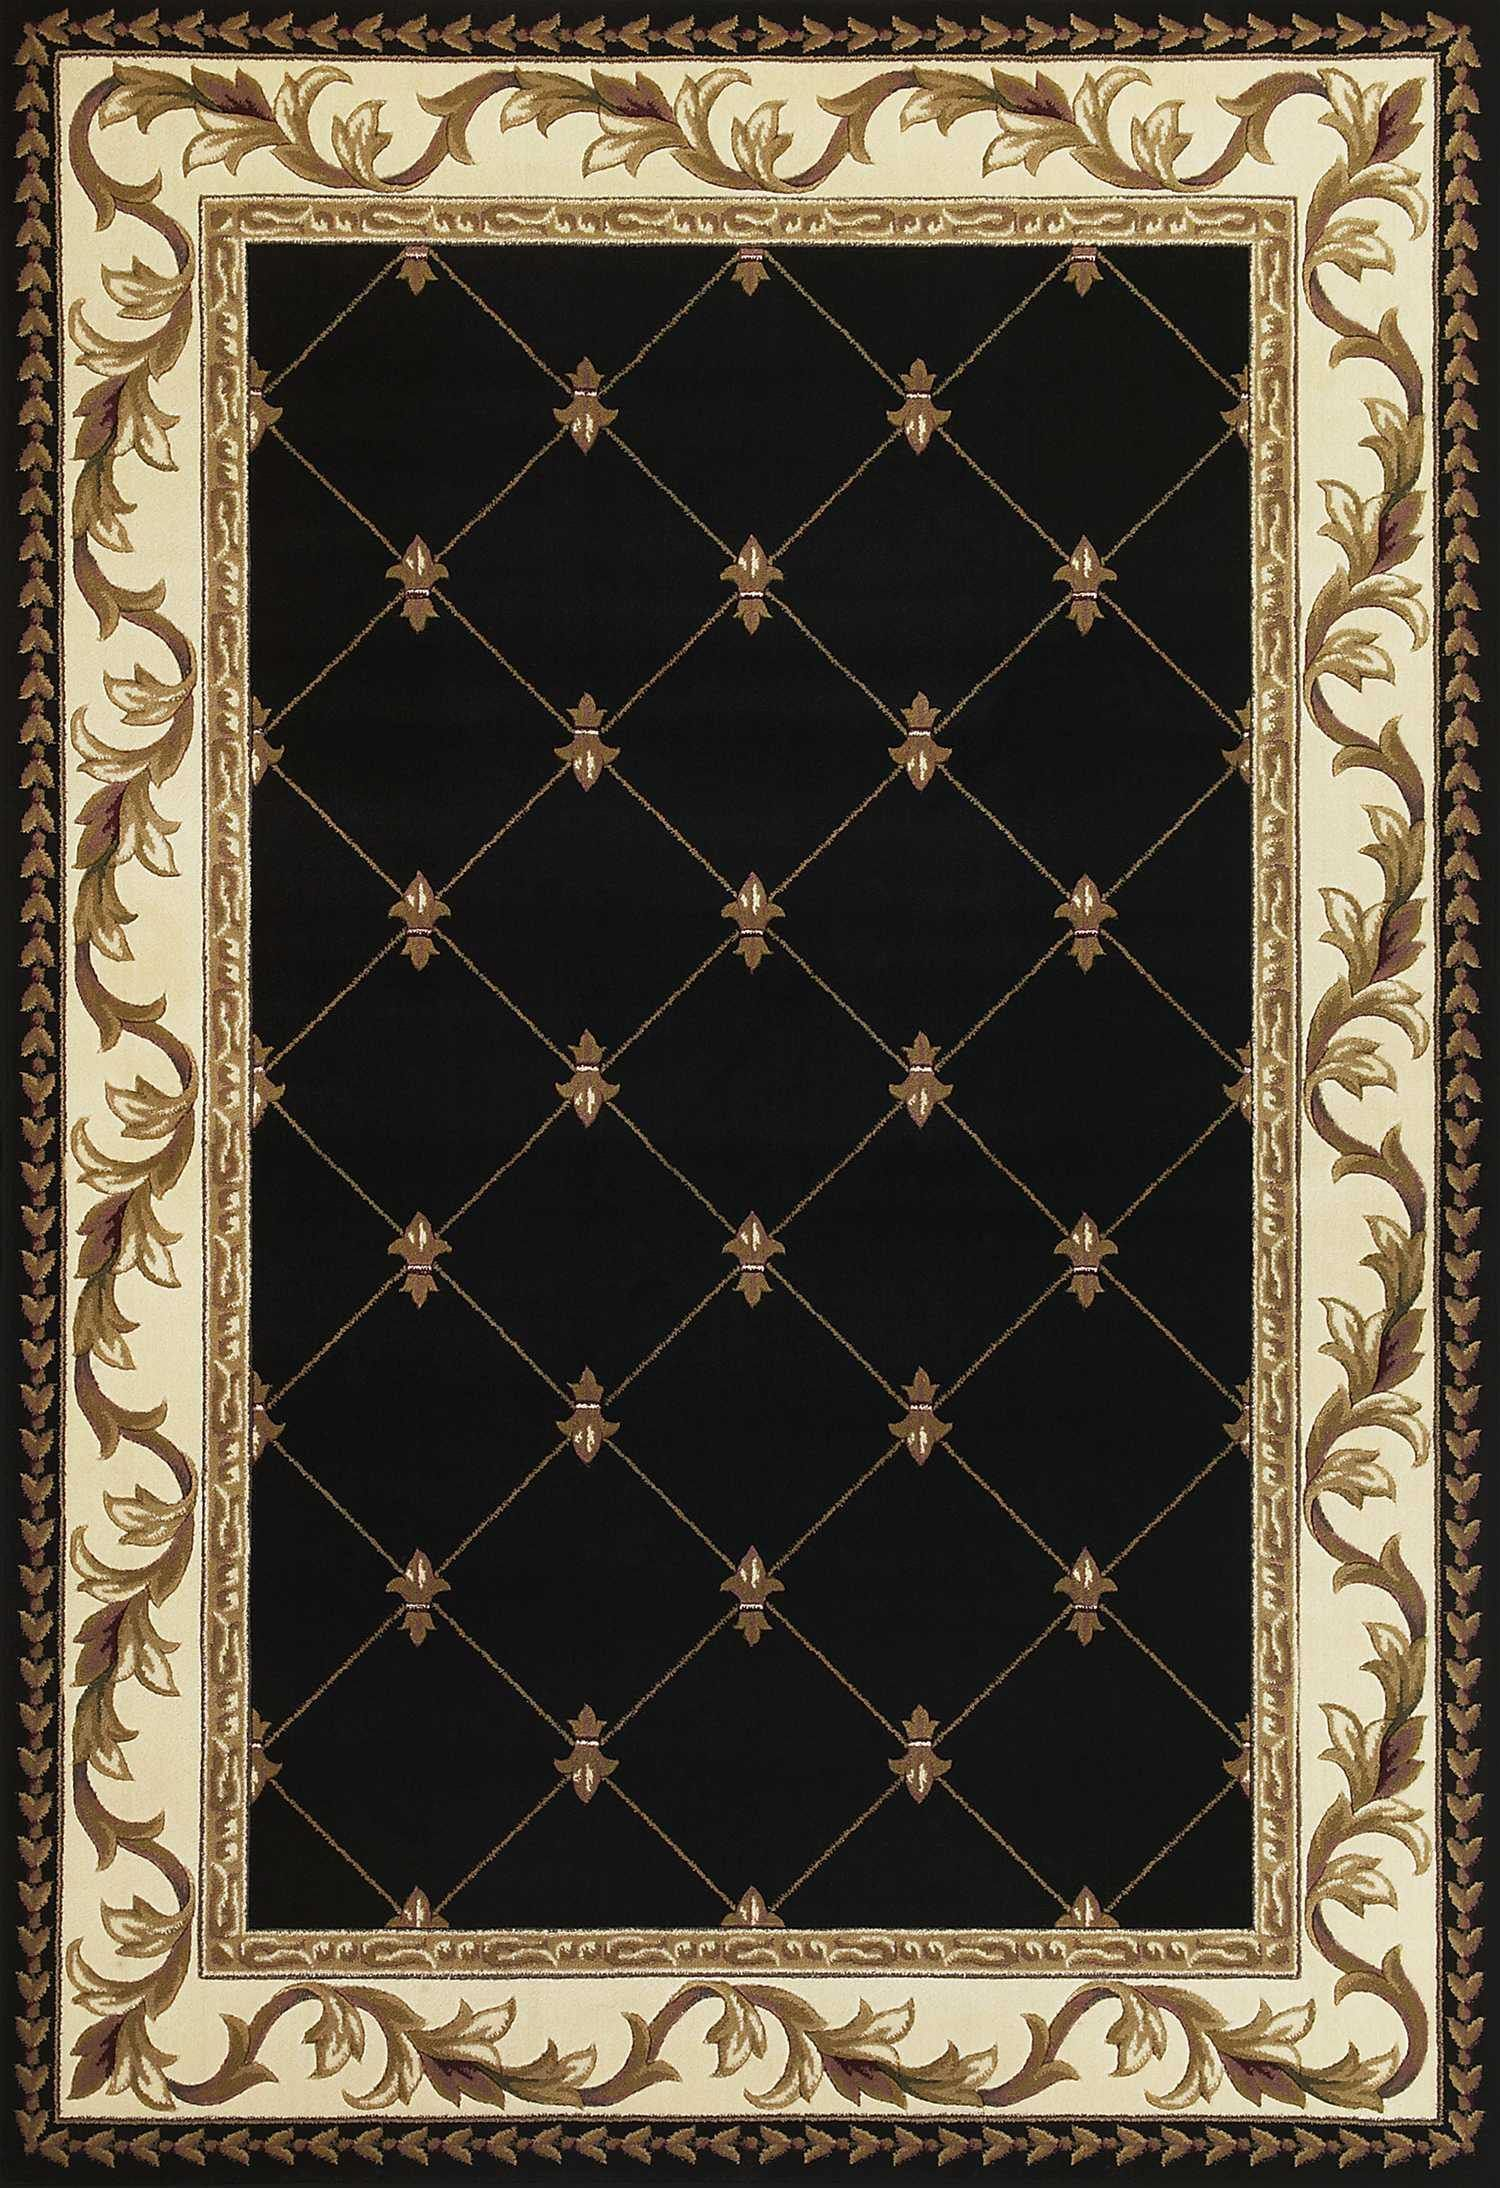 5 X 8 Black Fleur De Lis Diamond Bordered Indoor Area Rug In 2021 Kas Rugs Black Area Rugs Traditional Area Rugs Fleur de lis area rug